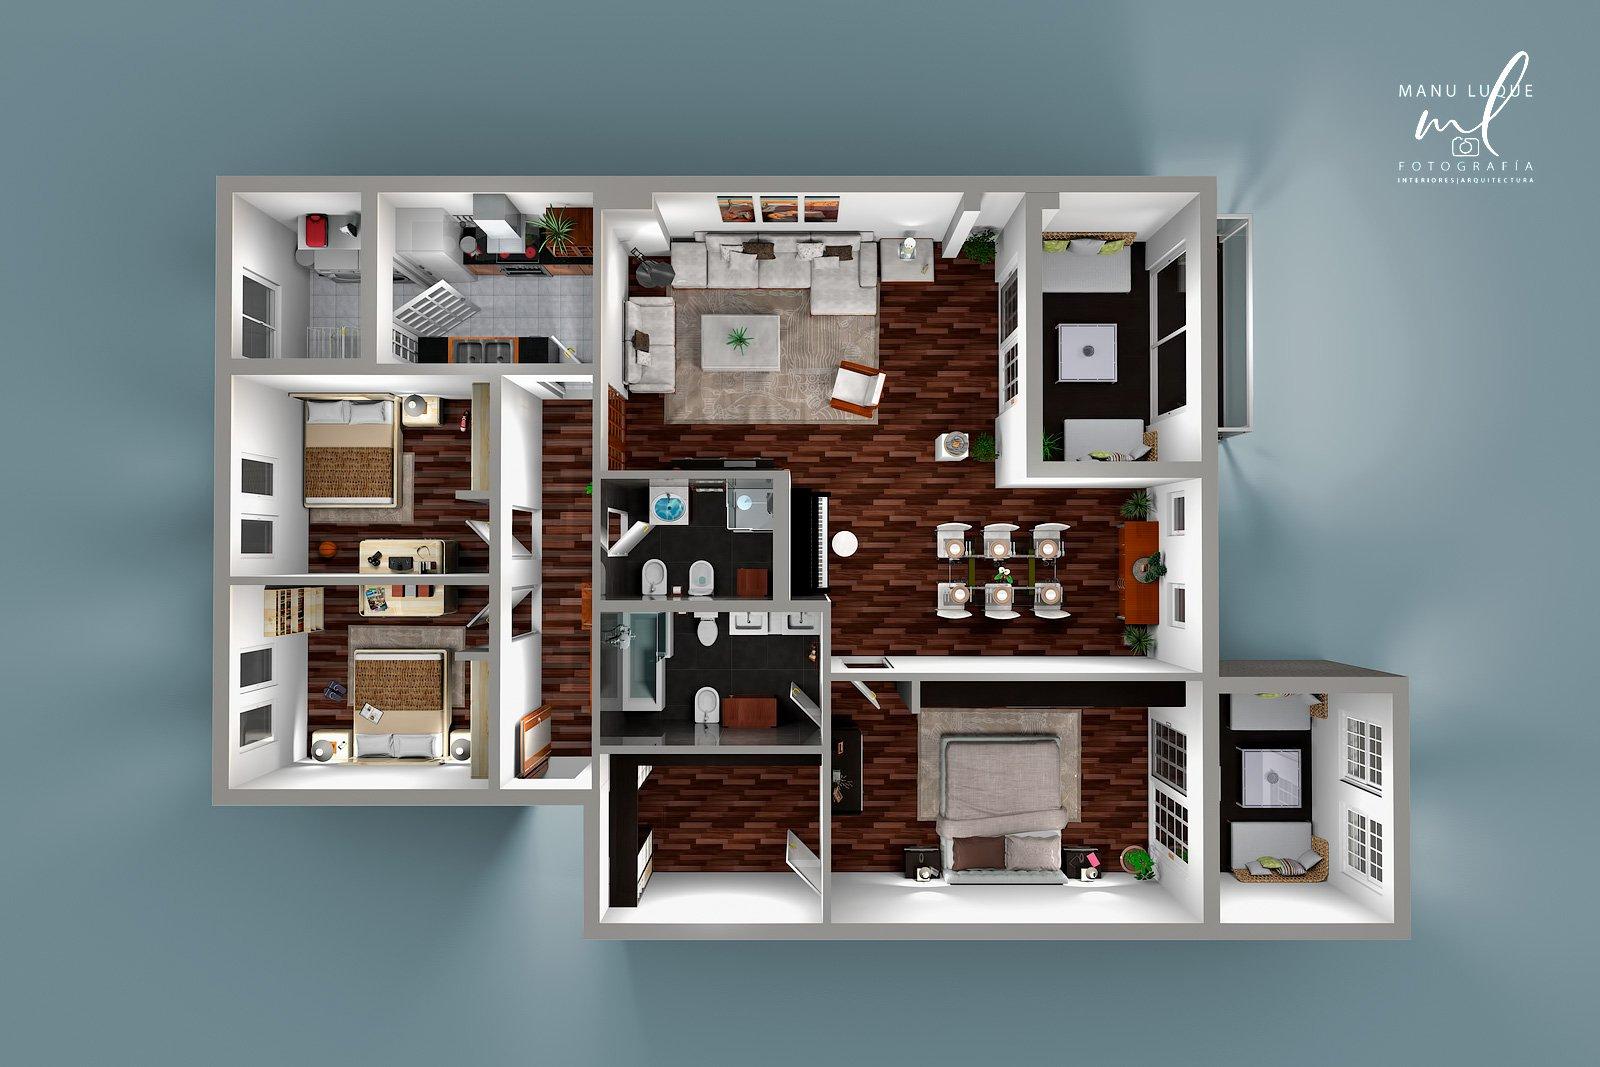 Plano 3D cenital casa 3 dormitorios